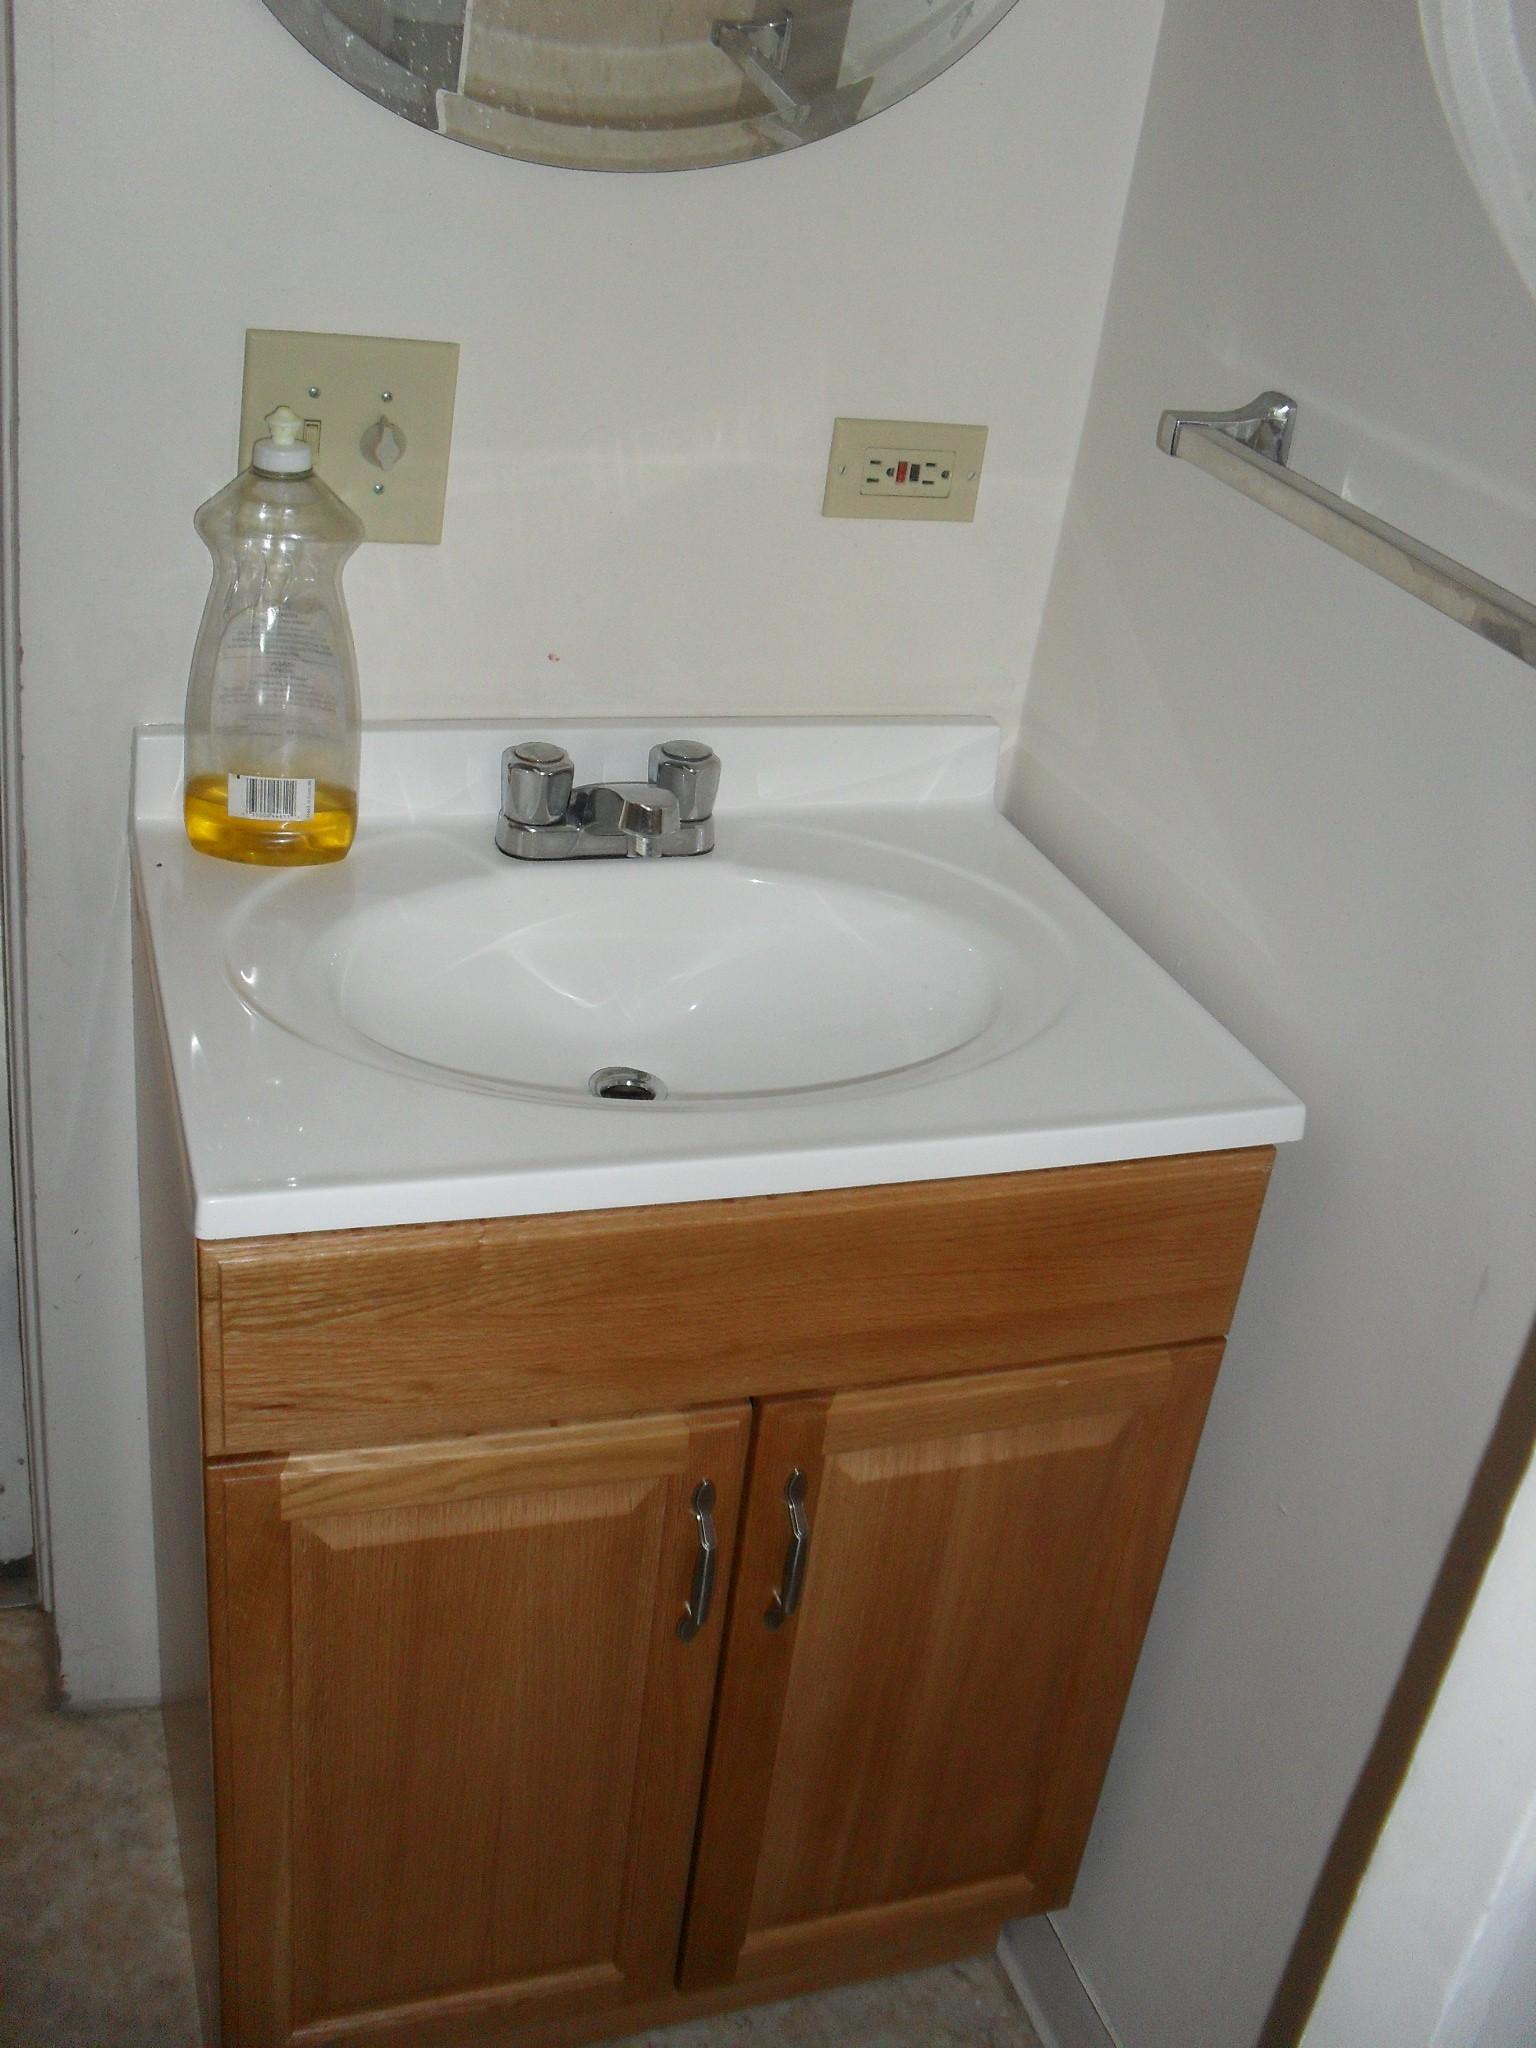 lovely home depot bathroom sinks wallpaper bathroom design ideas rh bridgeportbenedumfestival com